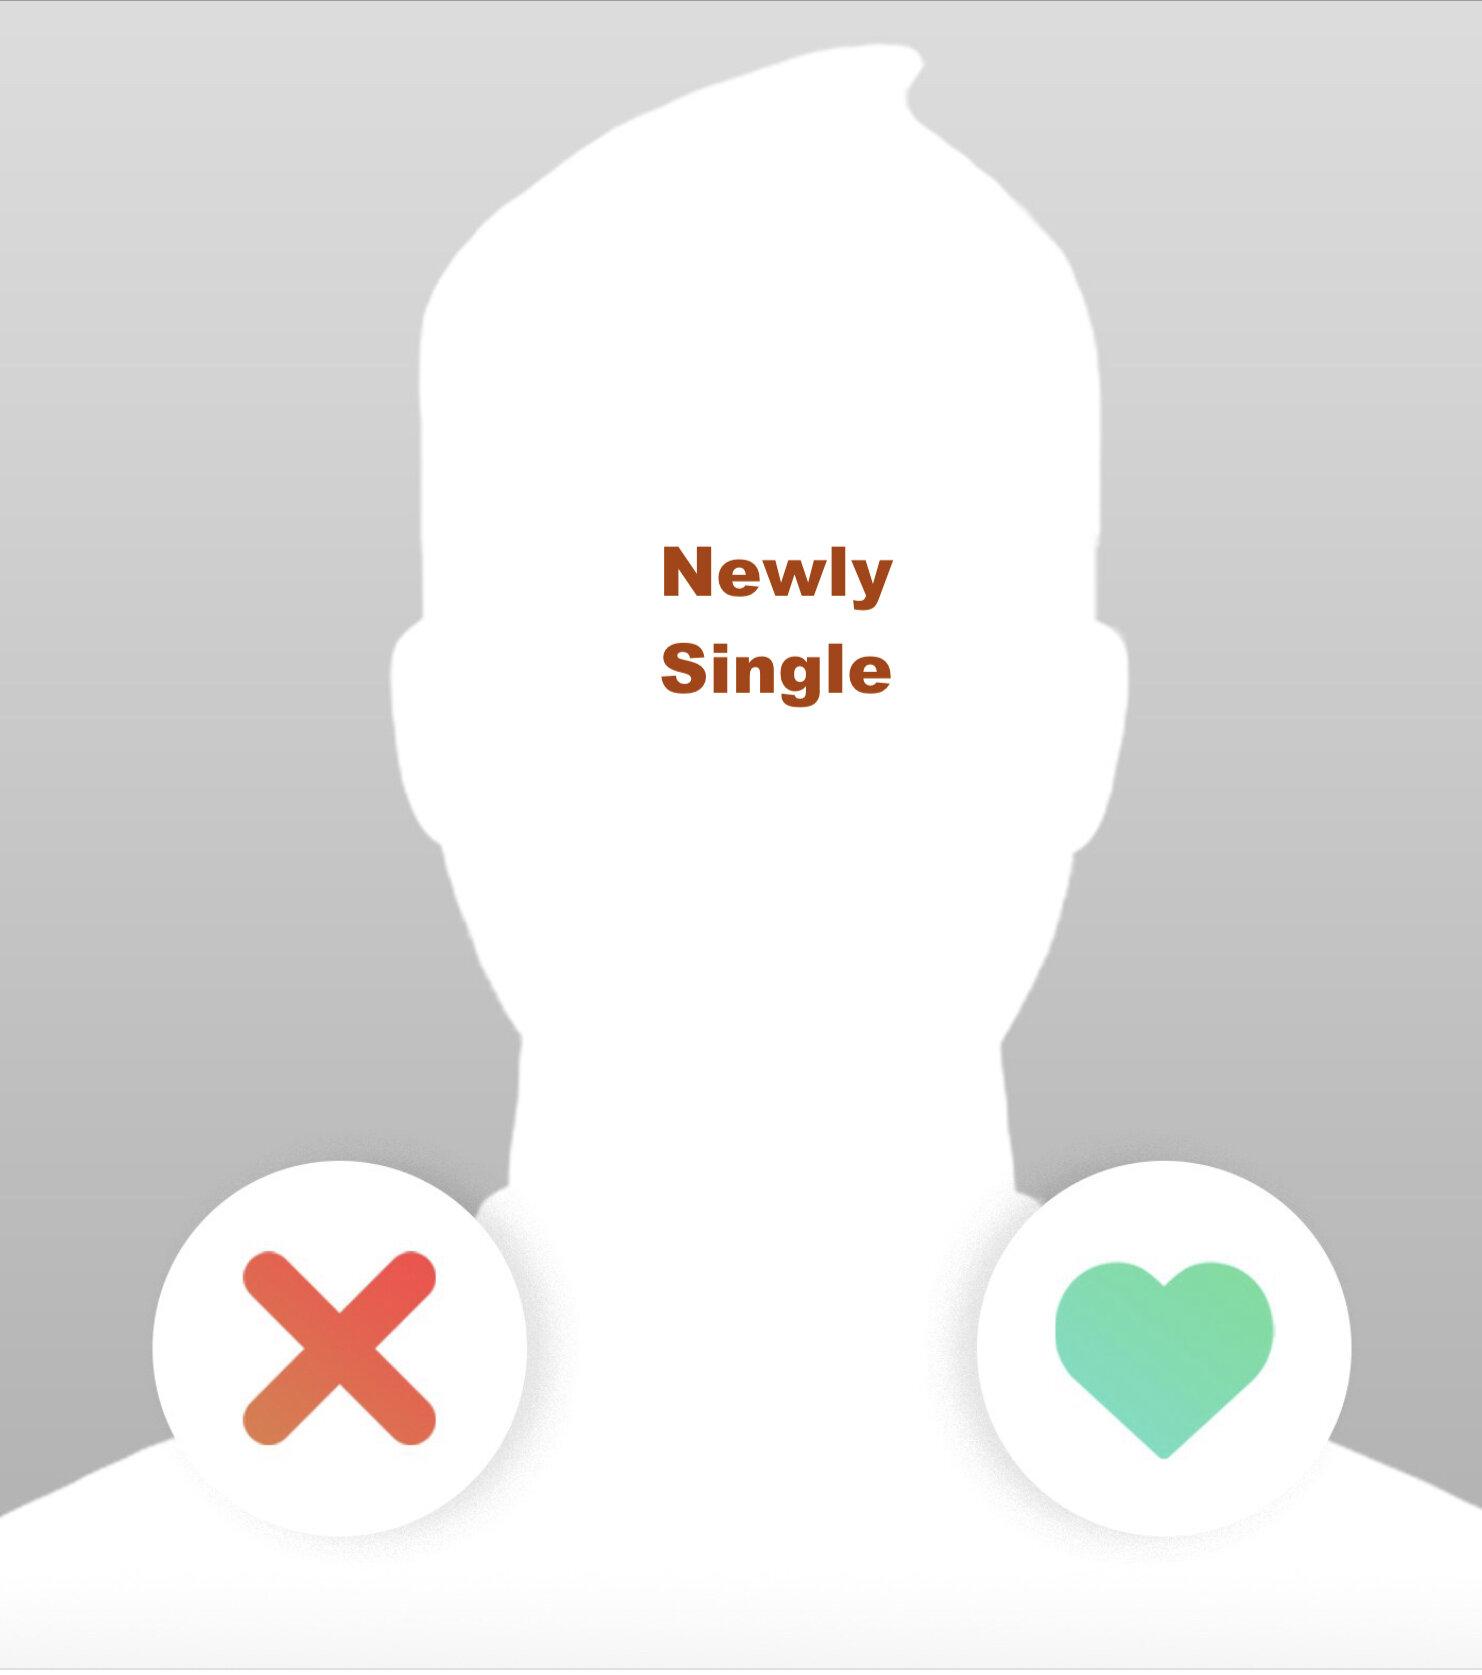 Tinder Blog 1 - newly single.jpg